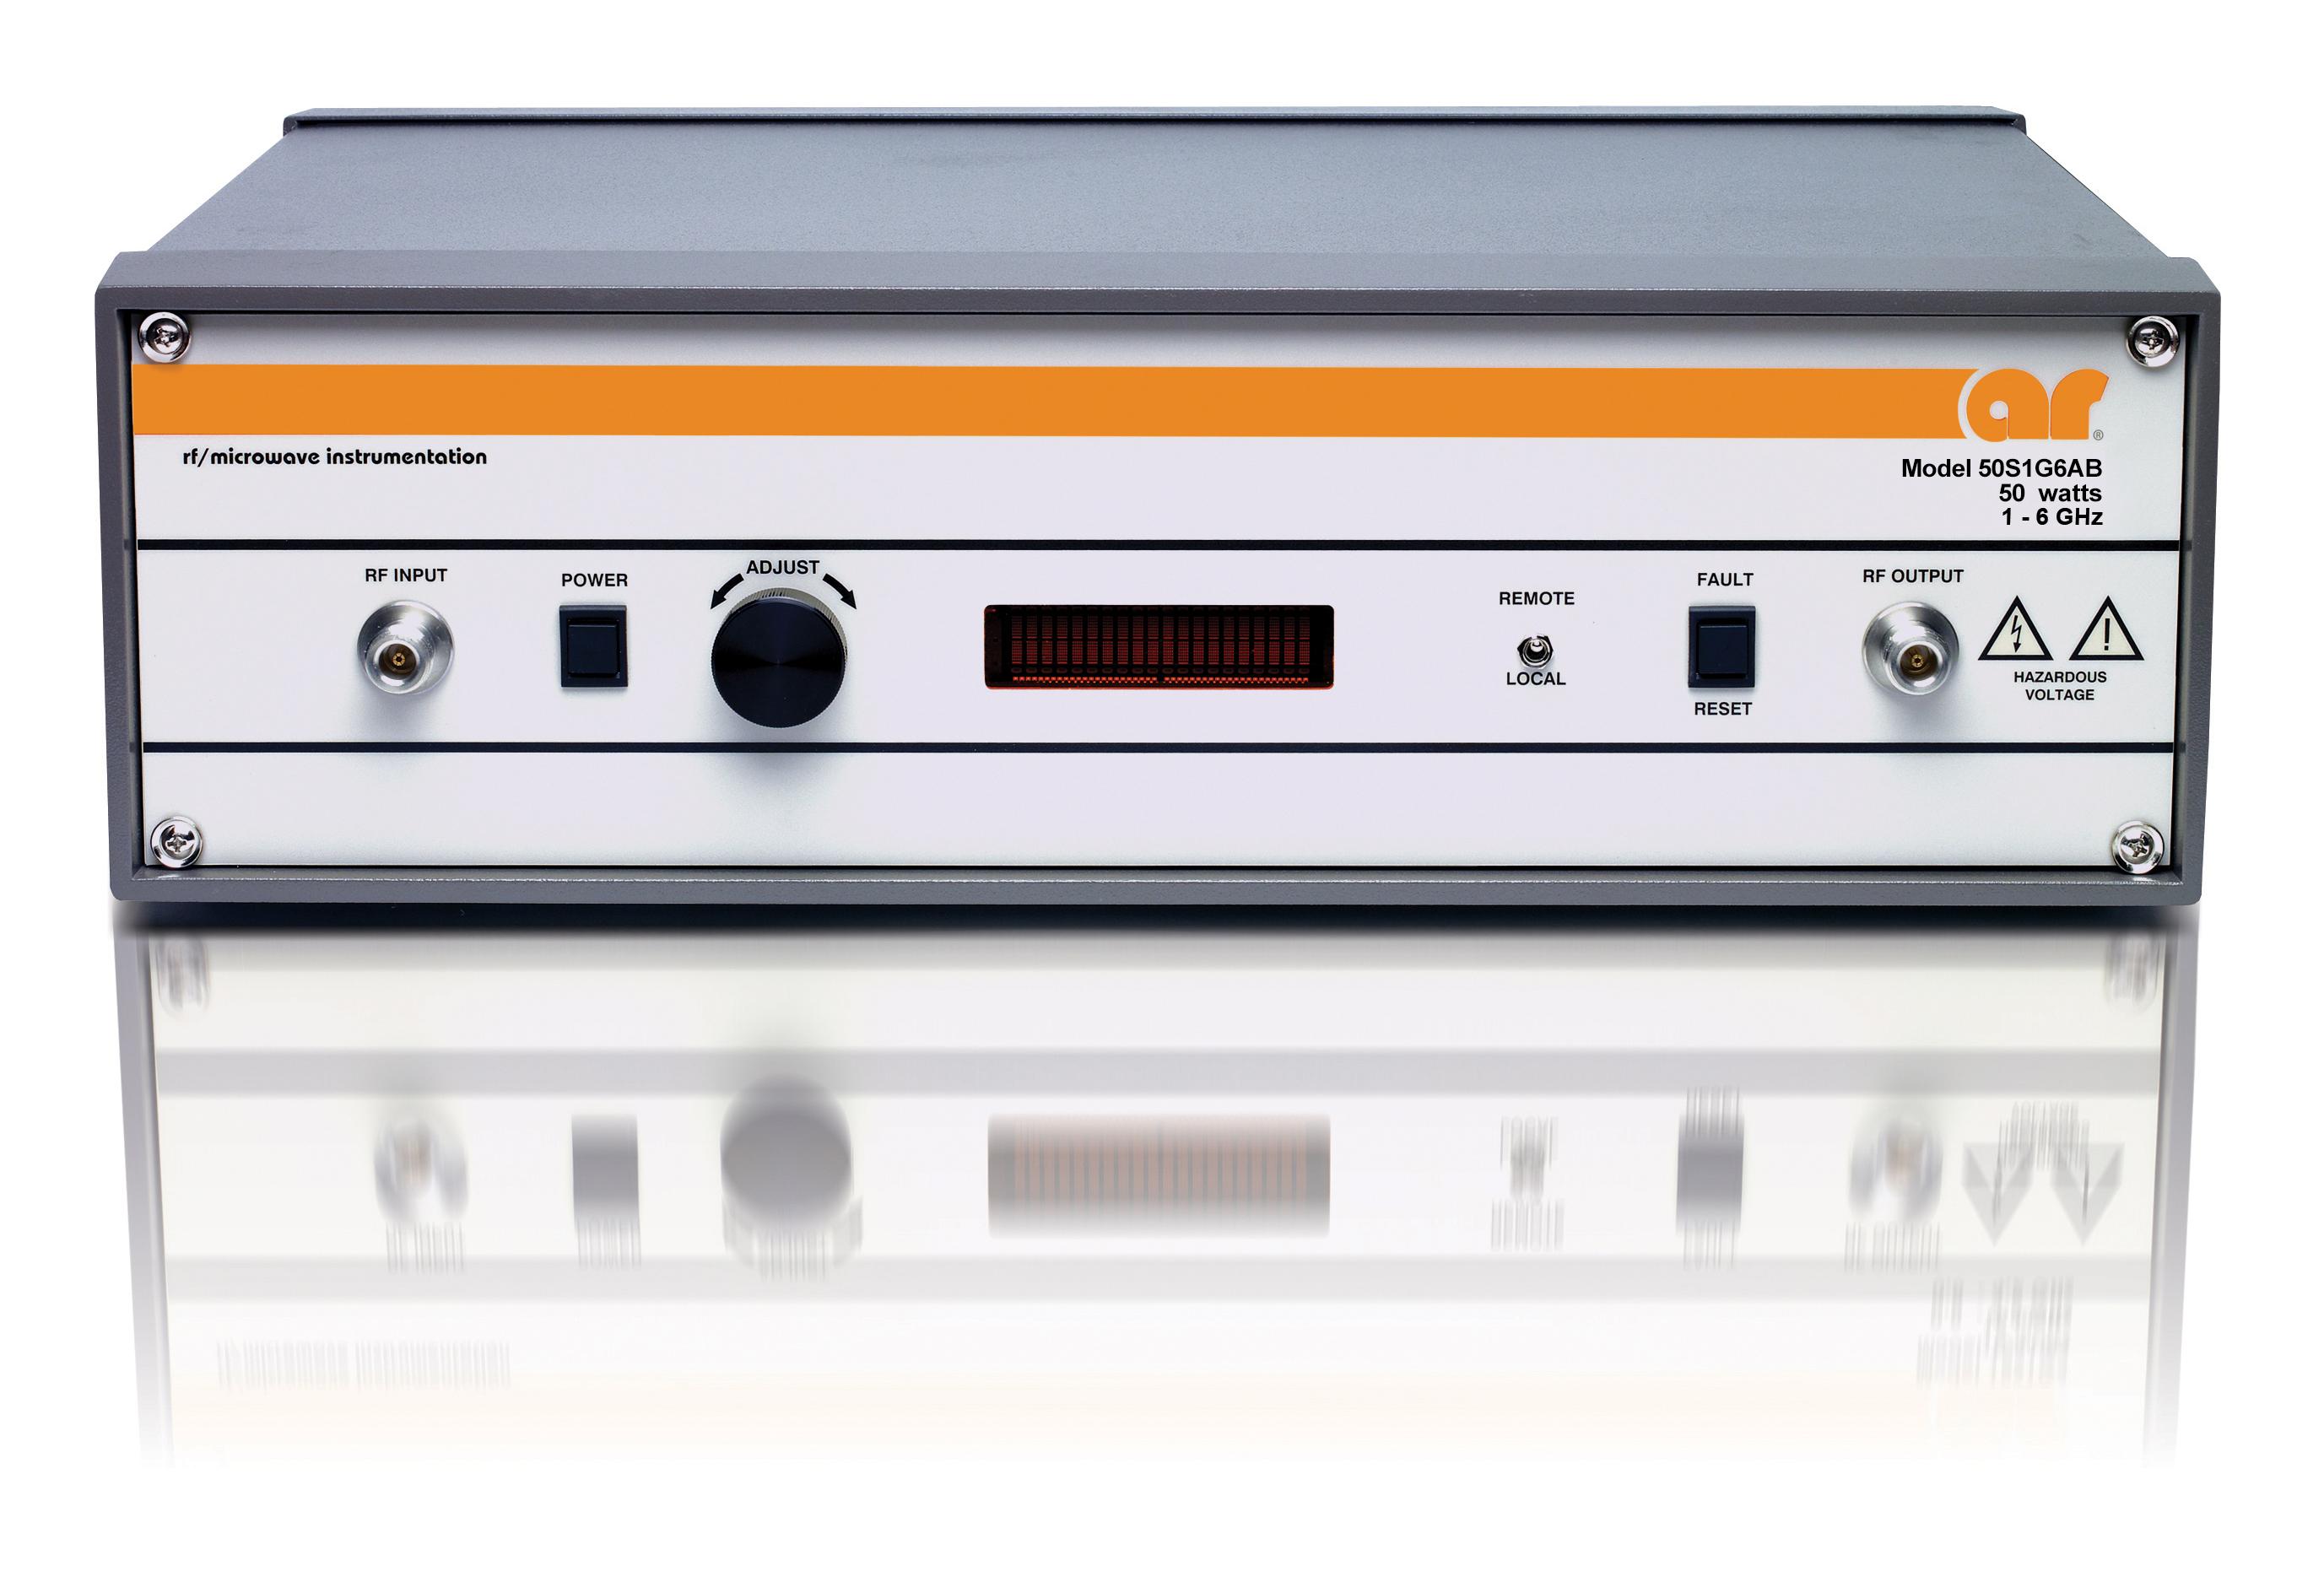 50 Watt 1 6 Ghz Amplifier 50s1g6ab W Transistor